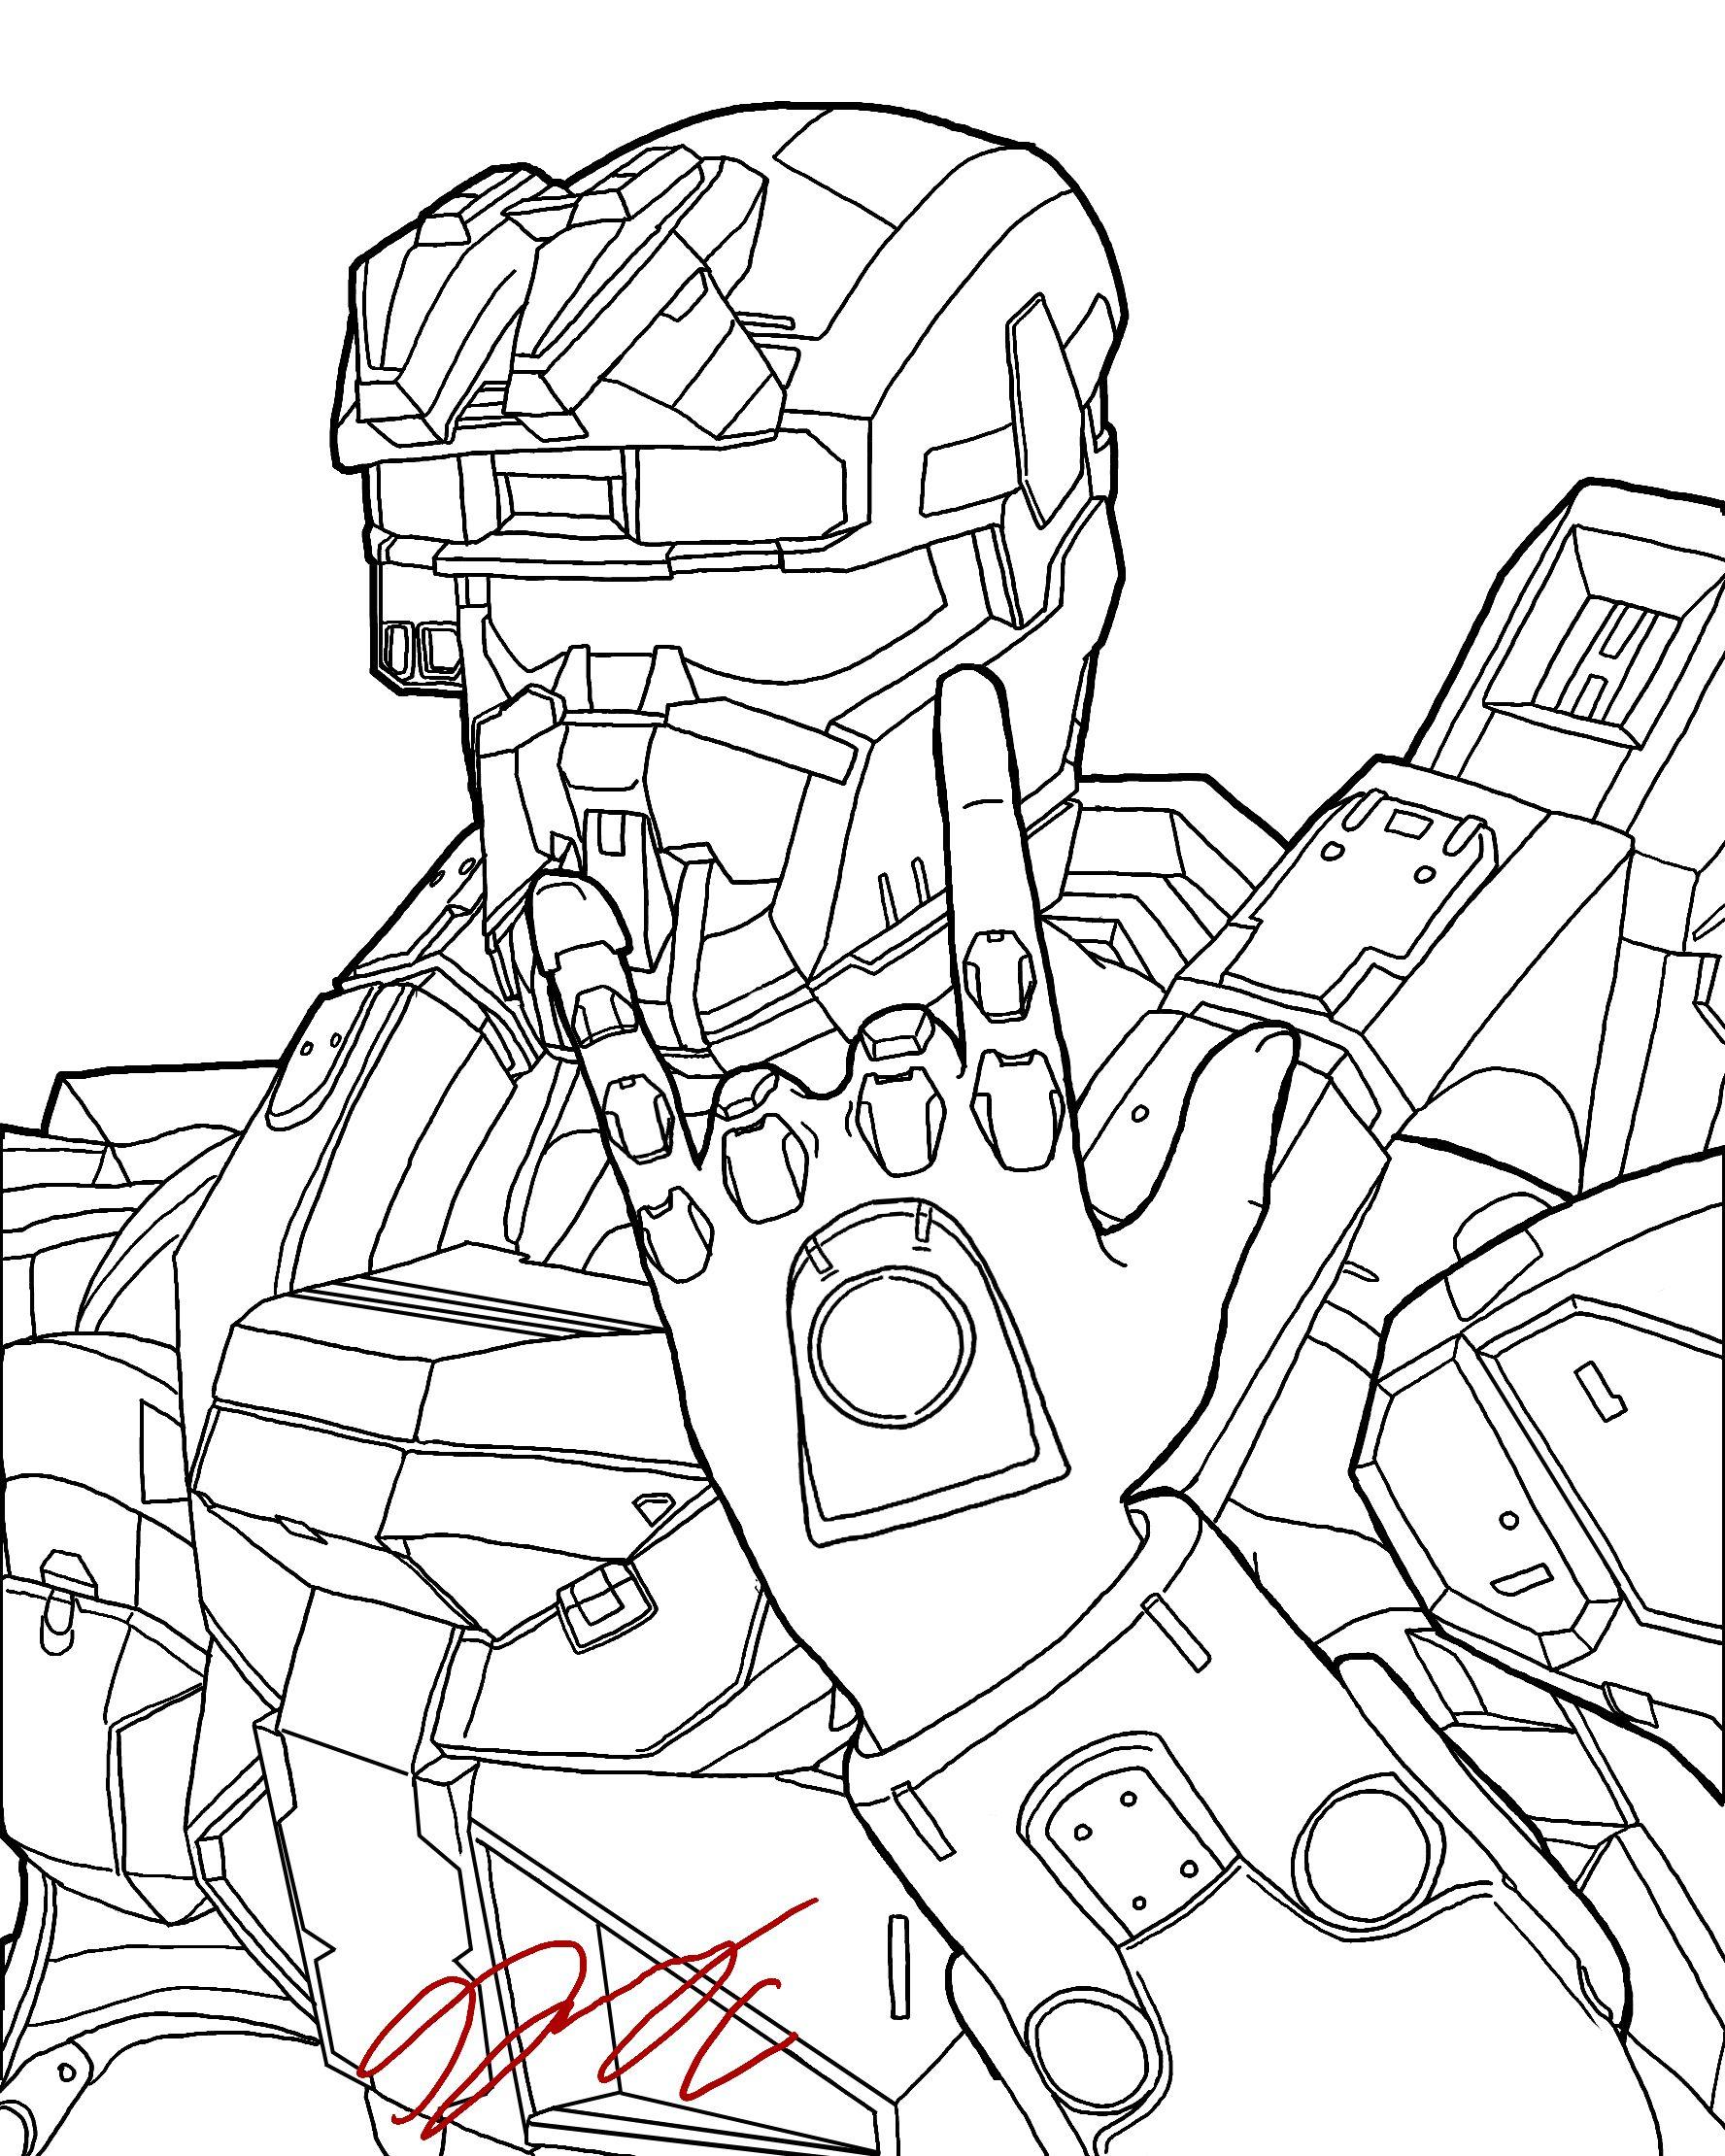 Master Chief Helmet Drawing At Getdrawings